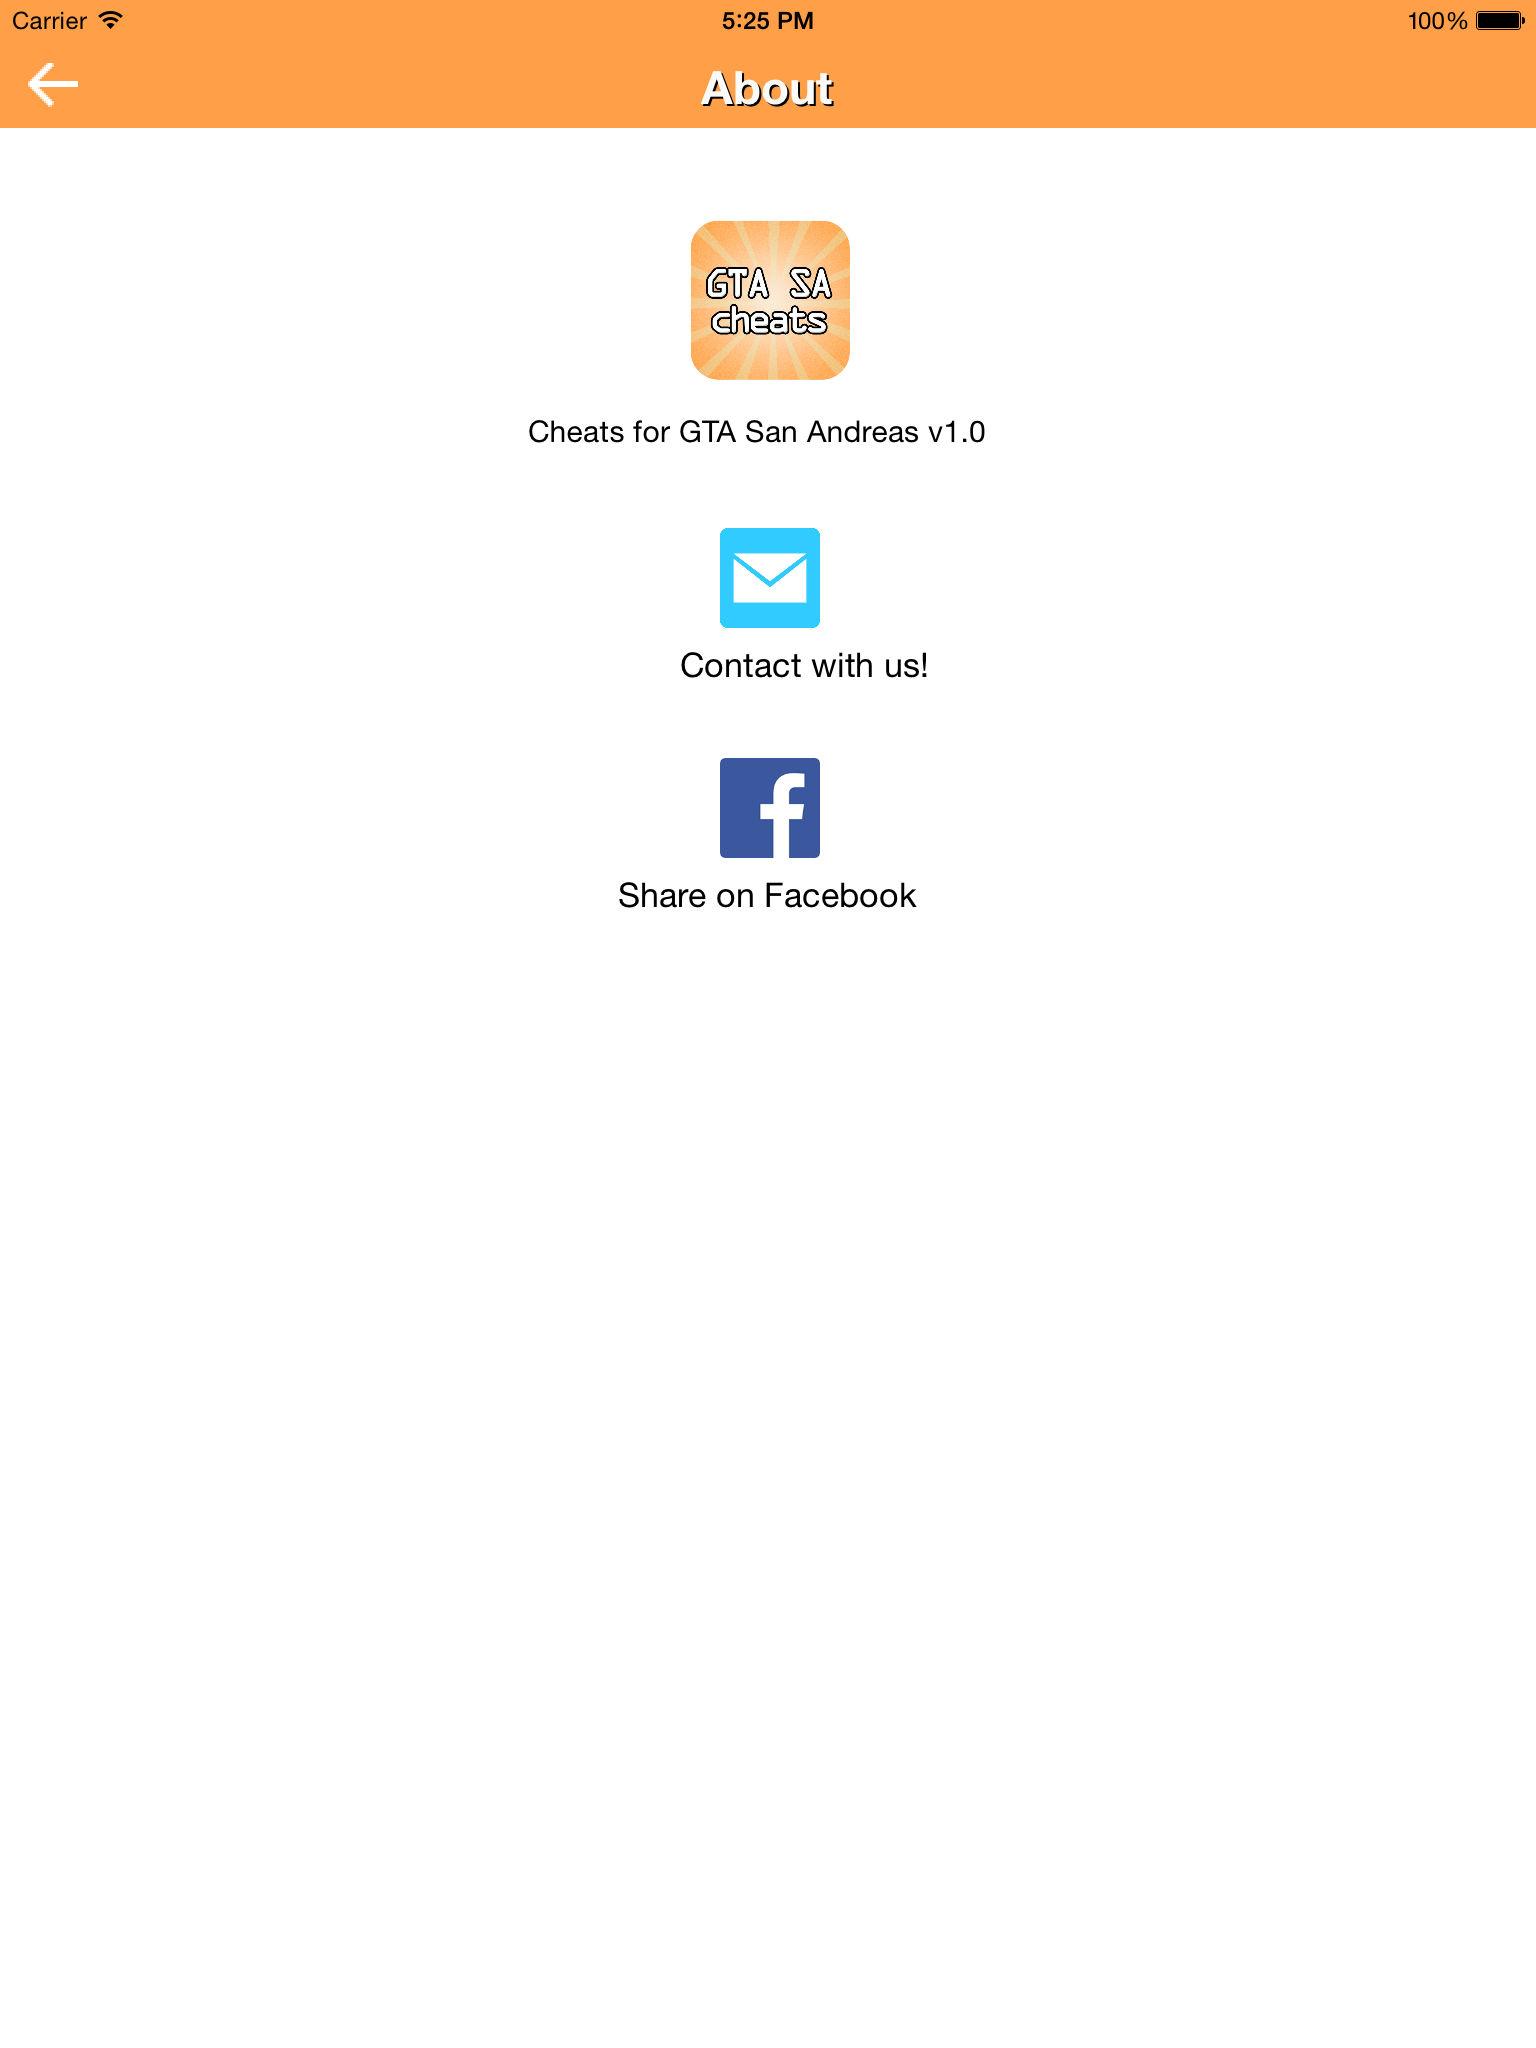 Cheats for GTA SA App Ranking and Store Data   App Annie